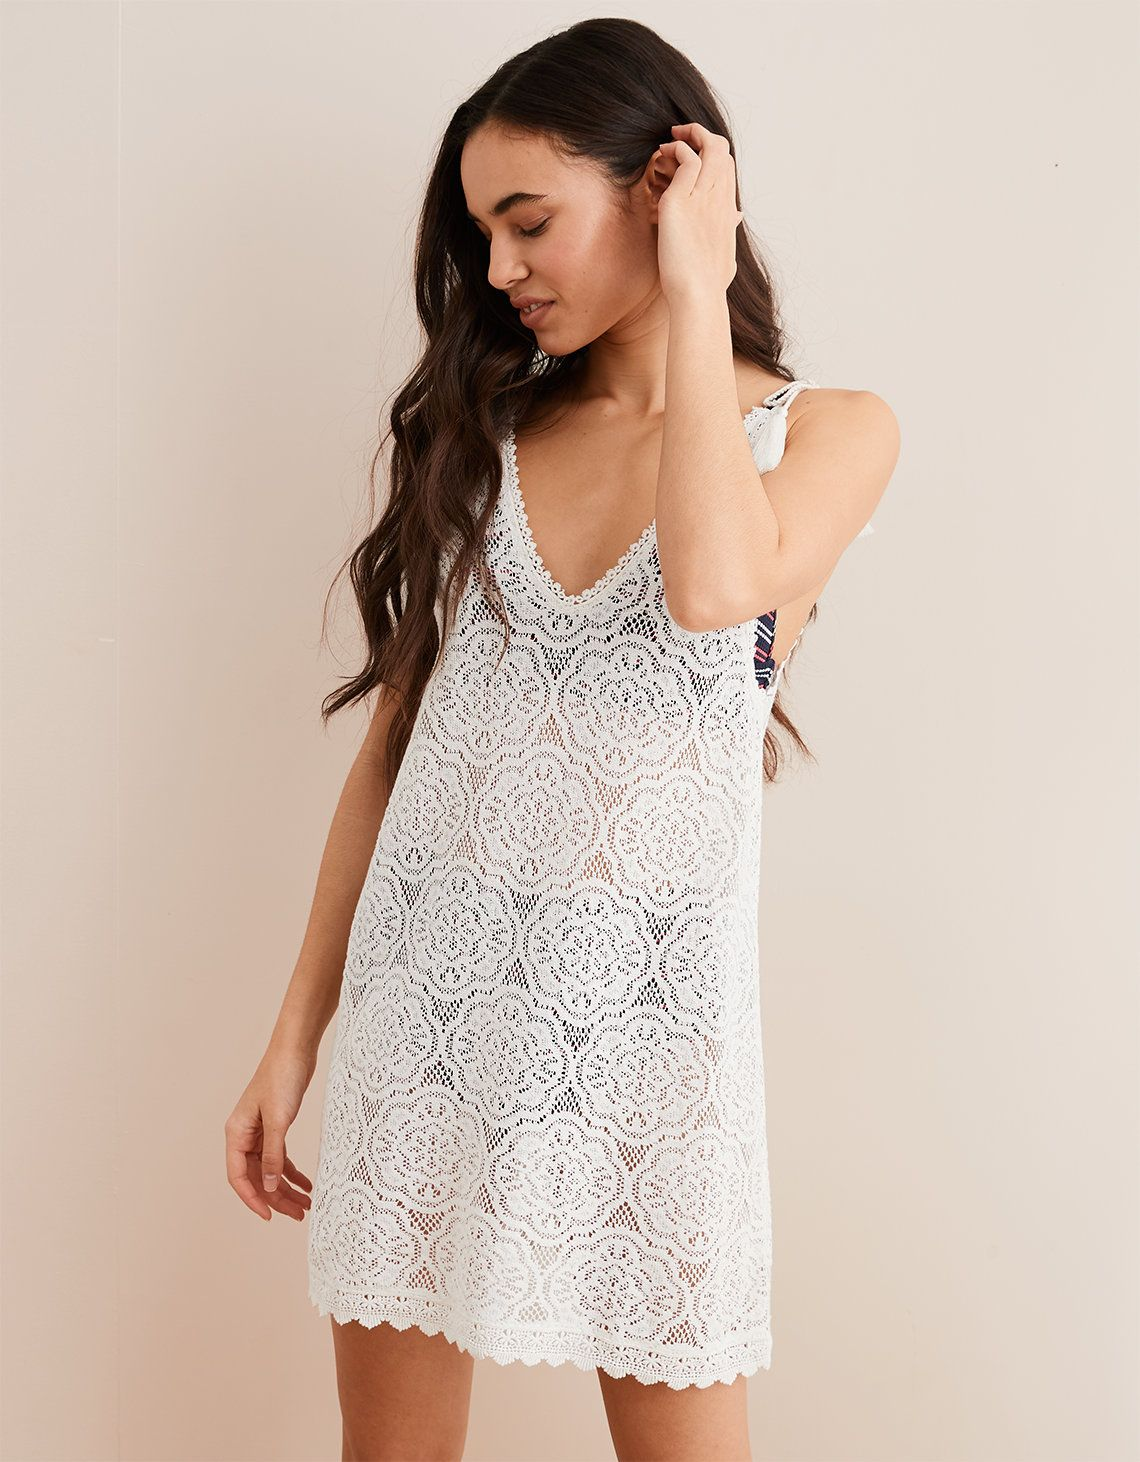 Aerie Lace Slip Dress White American Eagle Outfitters Lace Slip Dress Slip Dress Lace Slip [ 1462 x 1140 Pixel ]